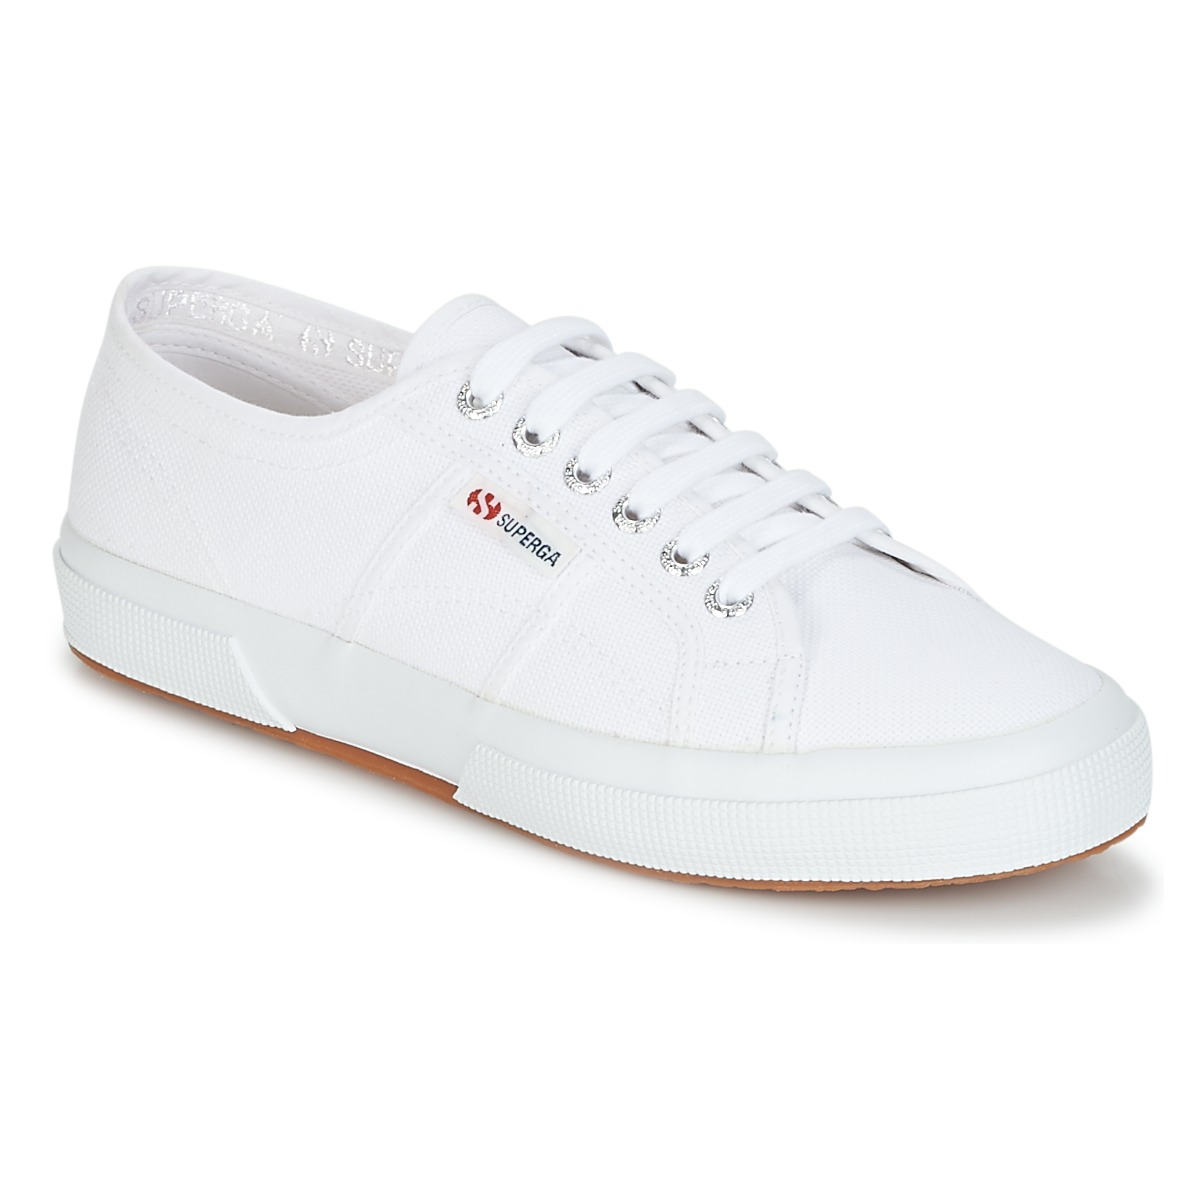 Superga 2750 CLASSIC White - Free